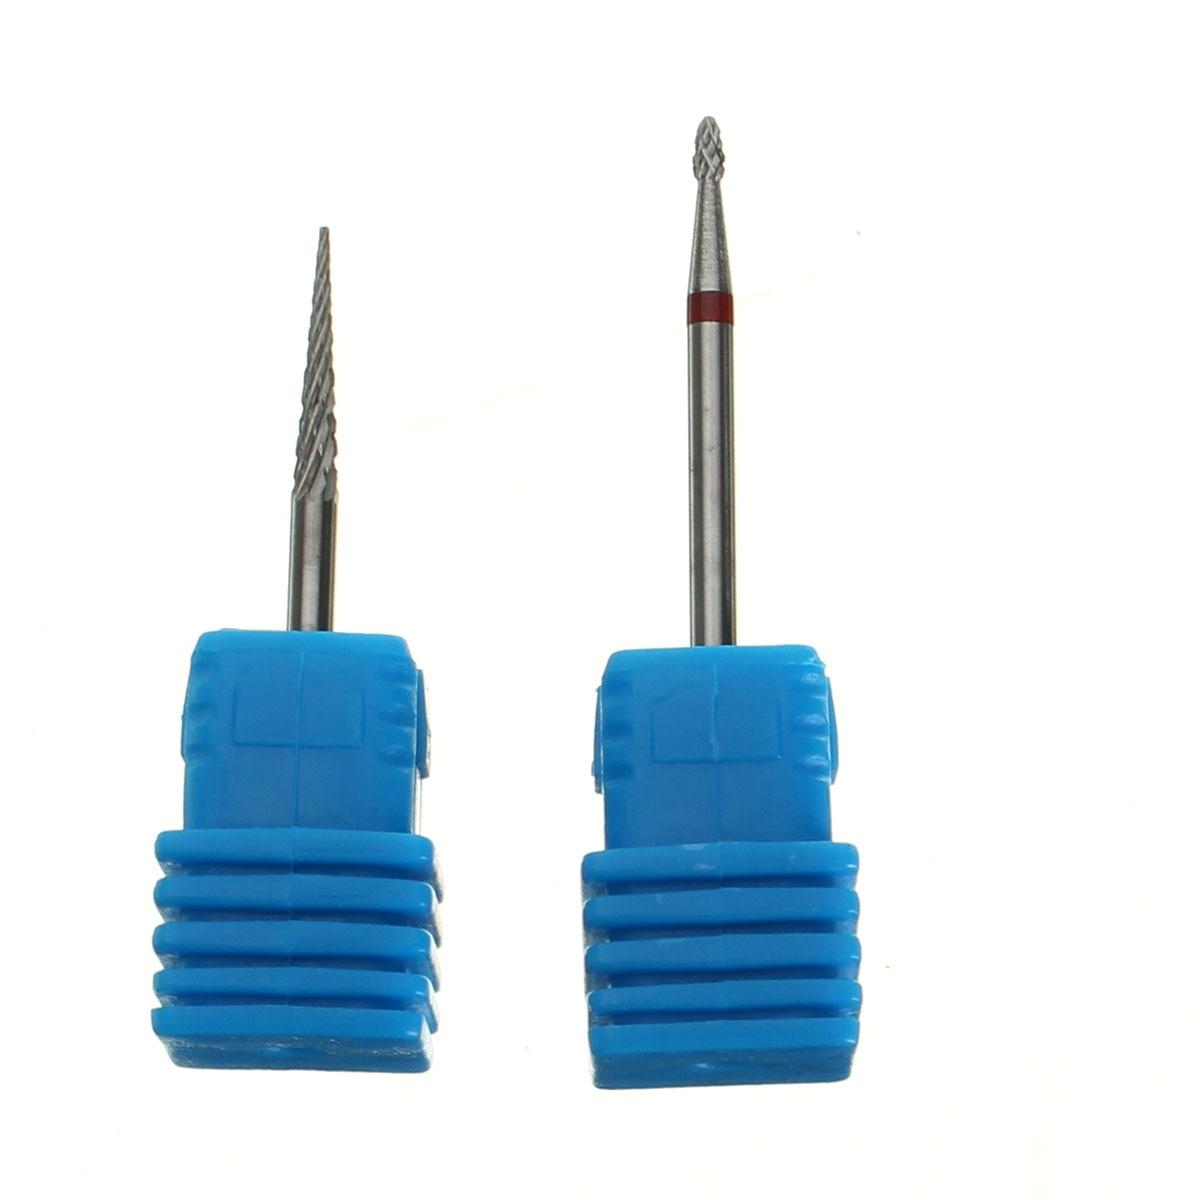 1pcs Carbide Remove Cuticle Nail Drill Bit Nail Art Salon Electric ...